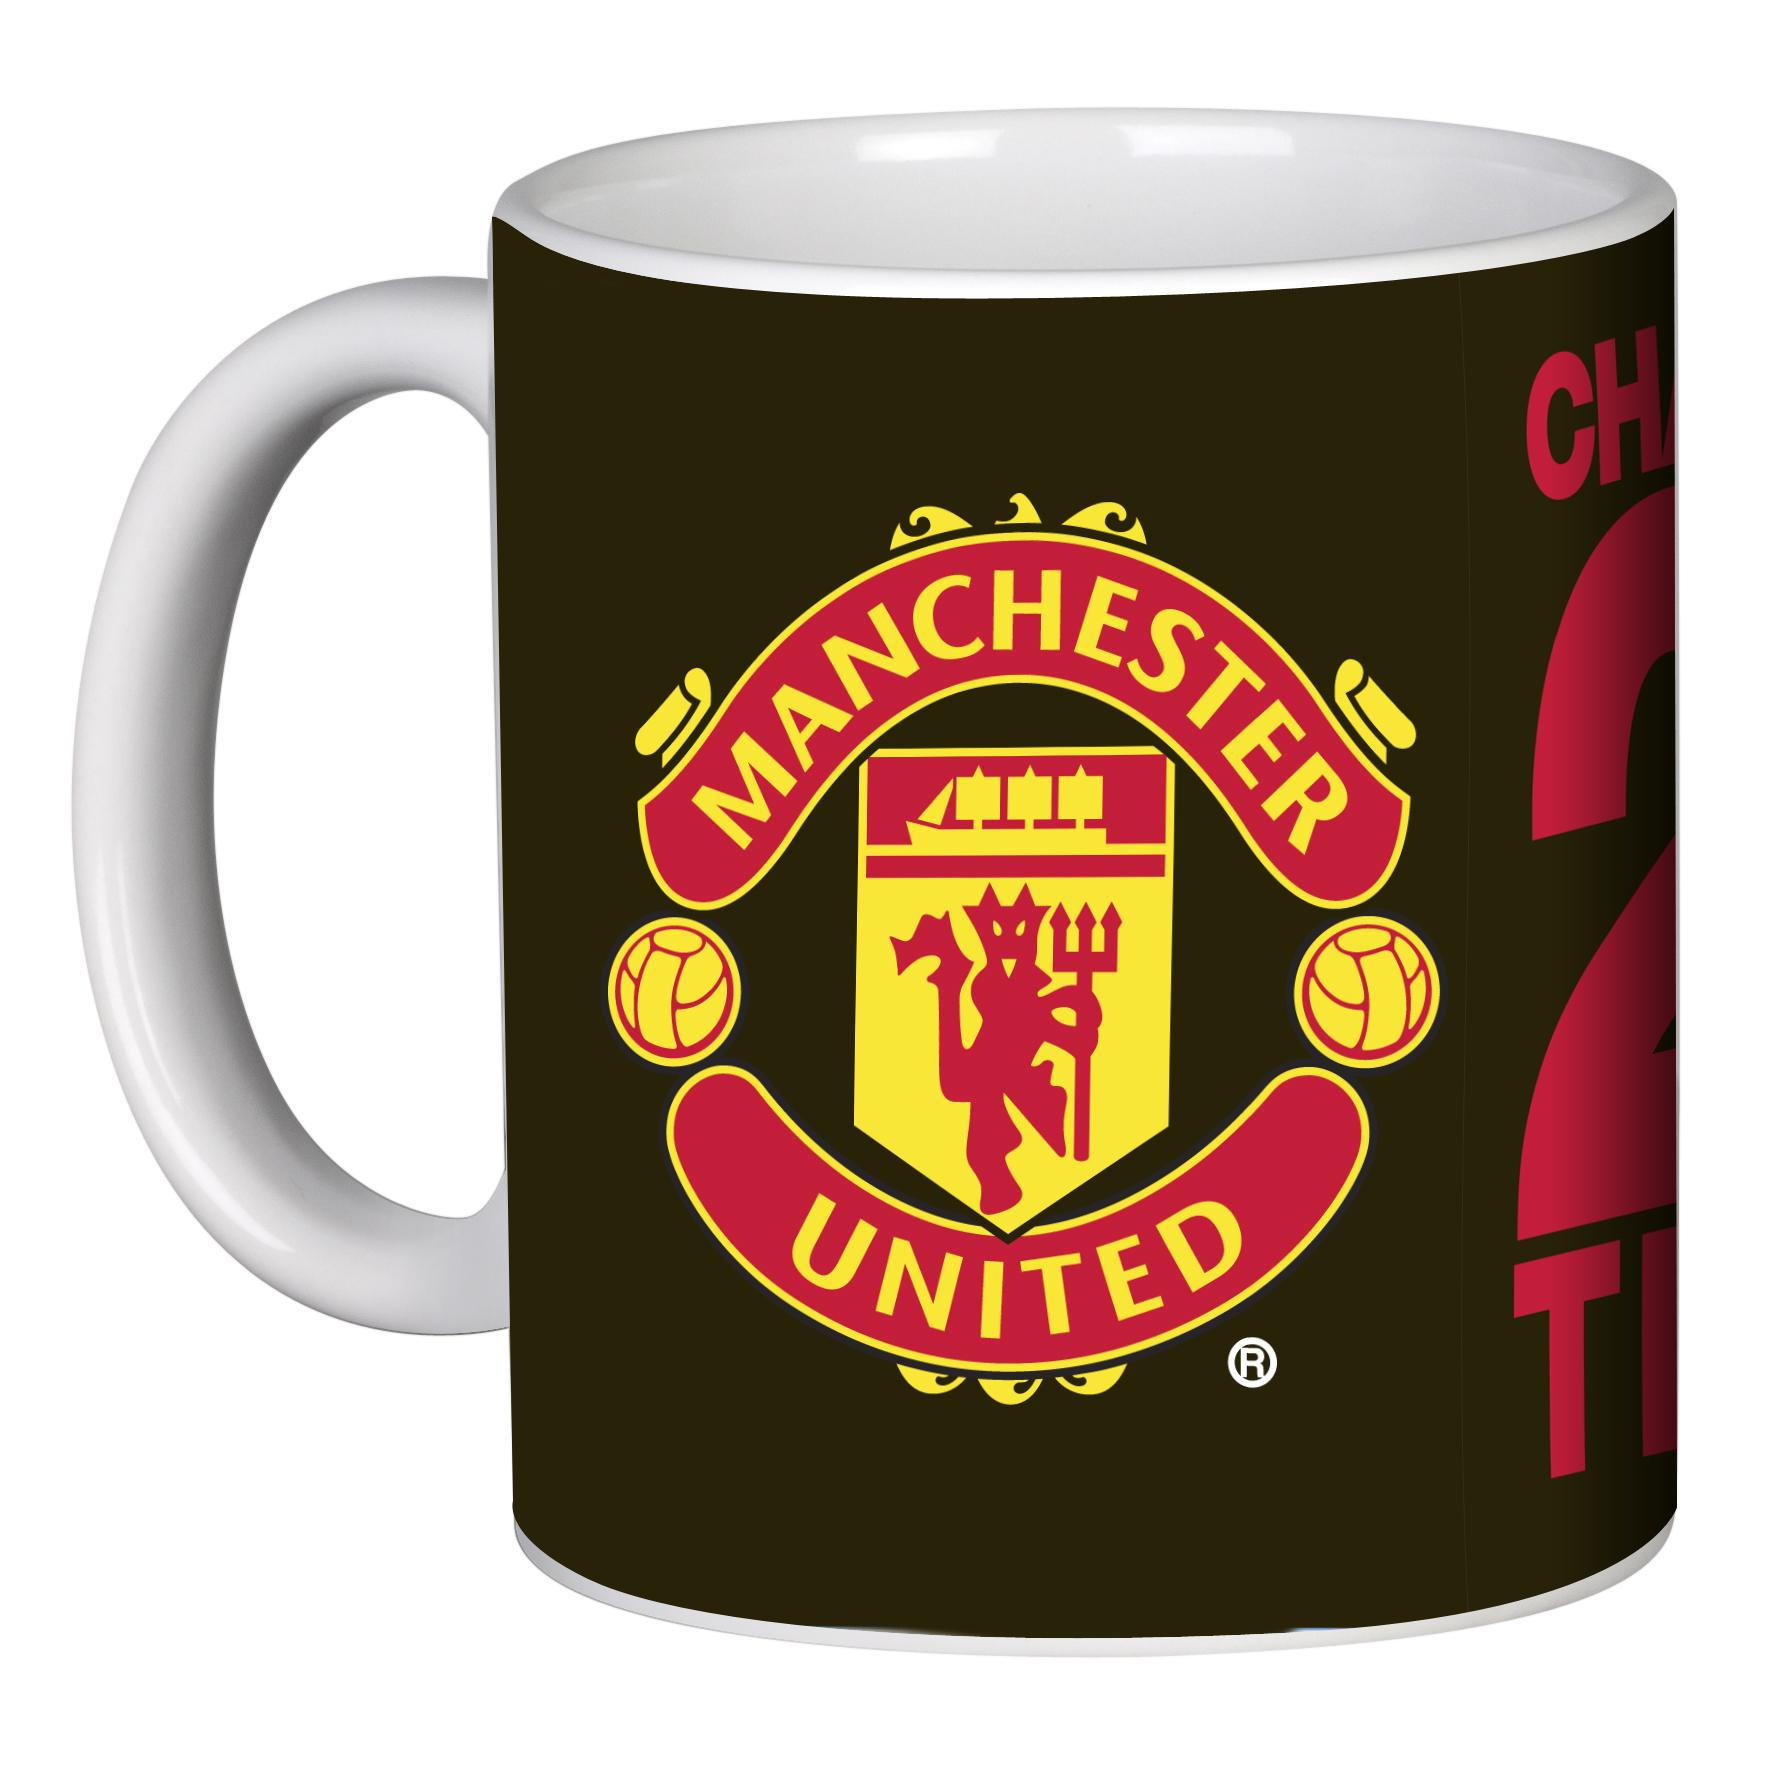 Manchester United 20 League Titles Mug